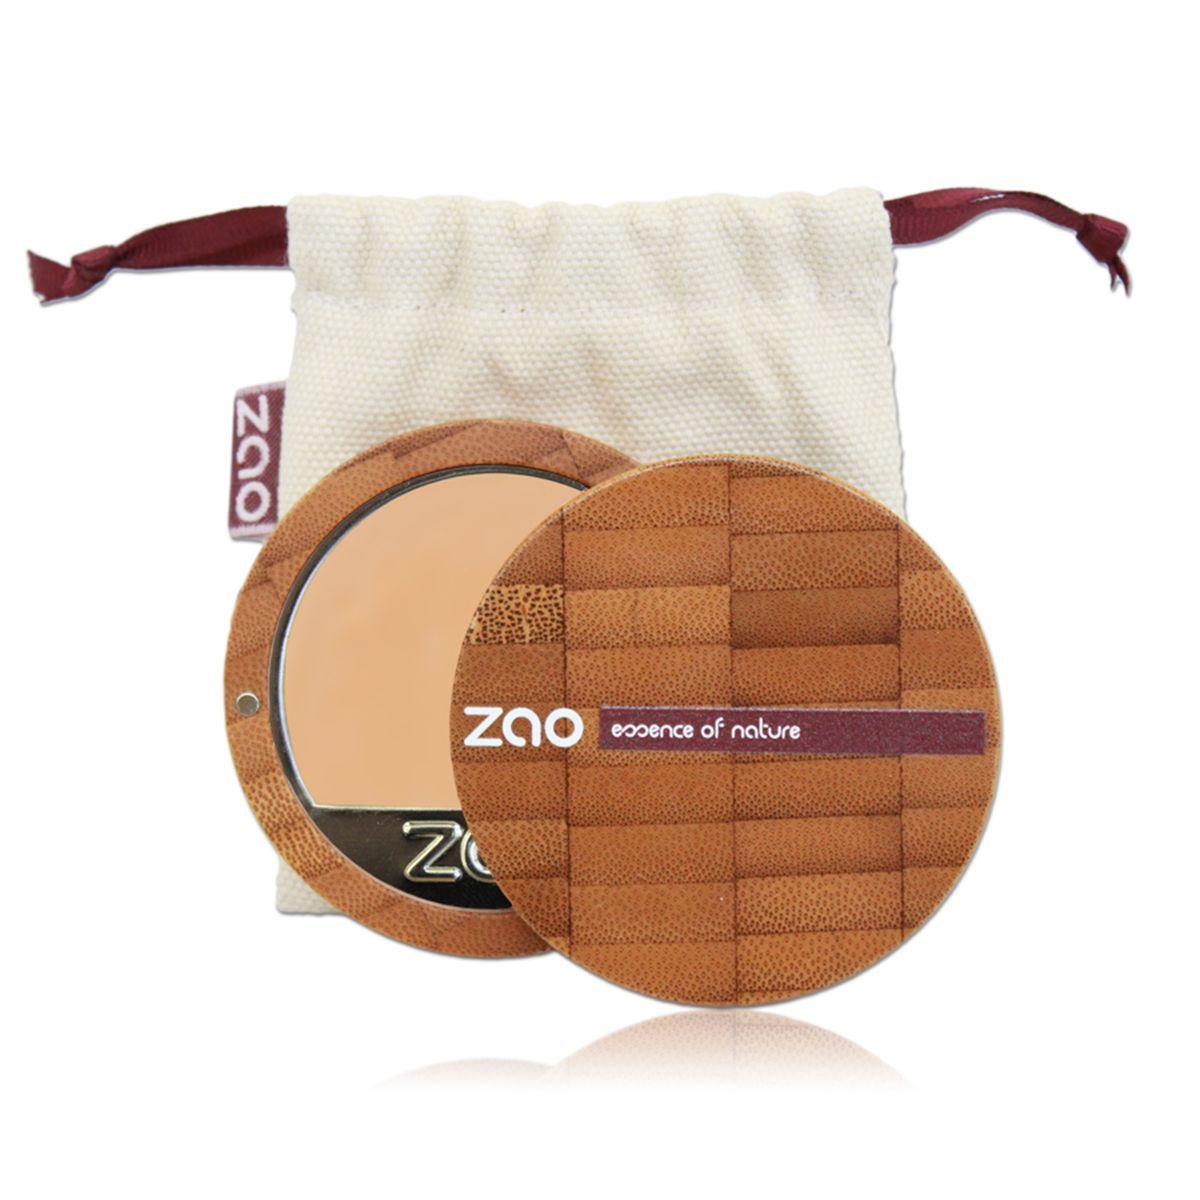 ZAO Compact Foundation Compact foundation, Organic